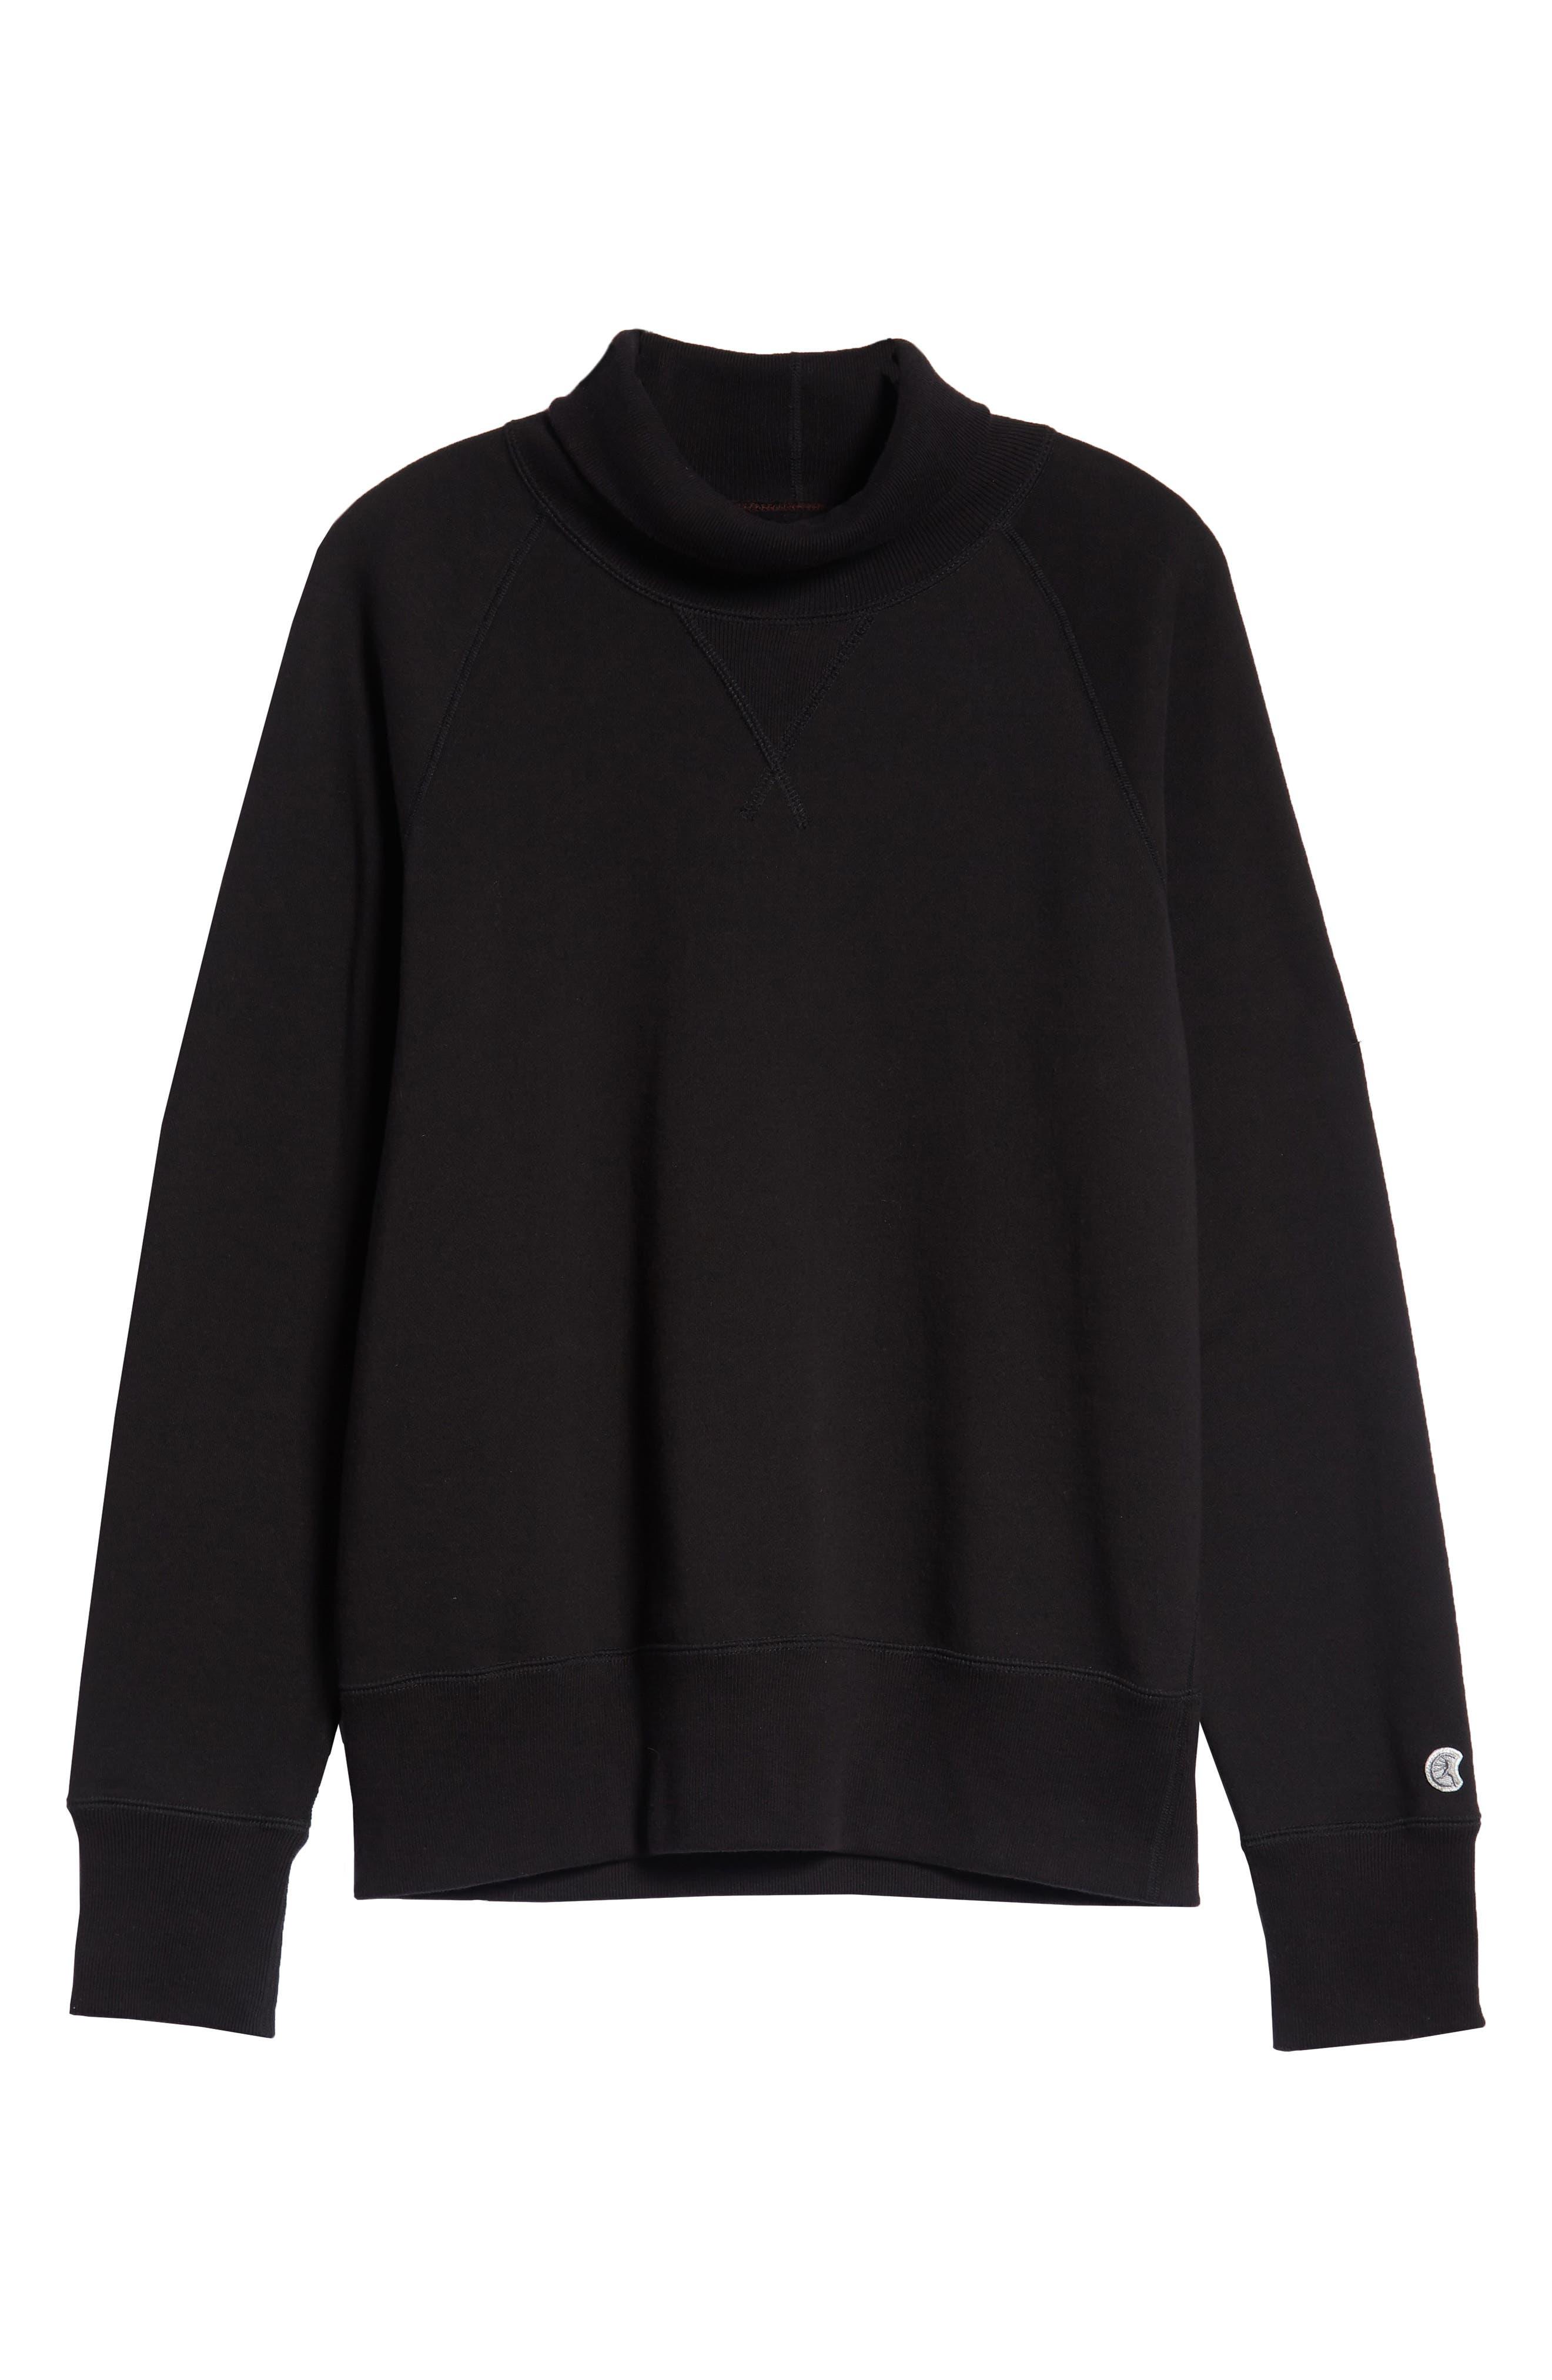 + Champion Turtleneck Sweatshirt,                             Alternate thumbnail 6, color,                             001